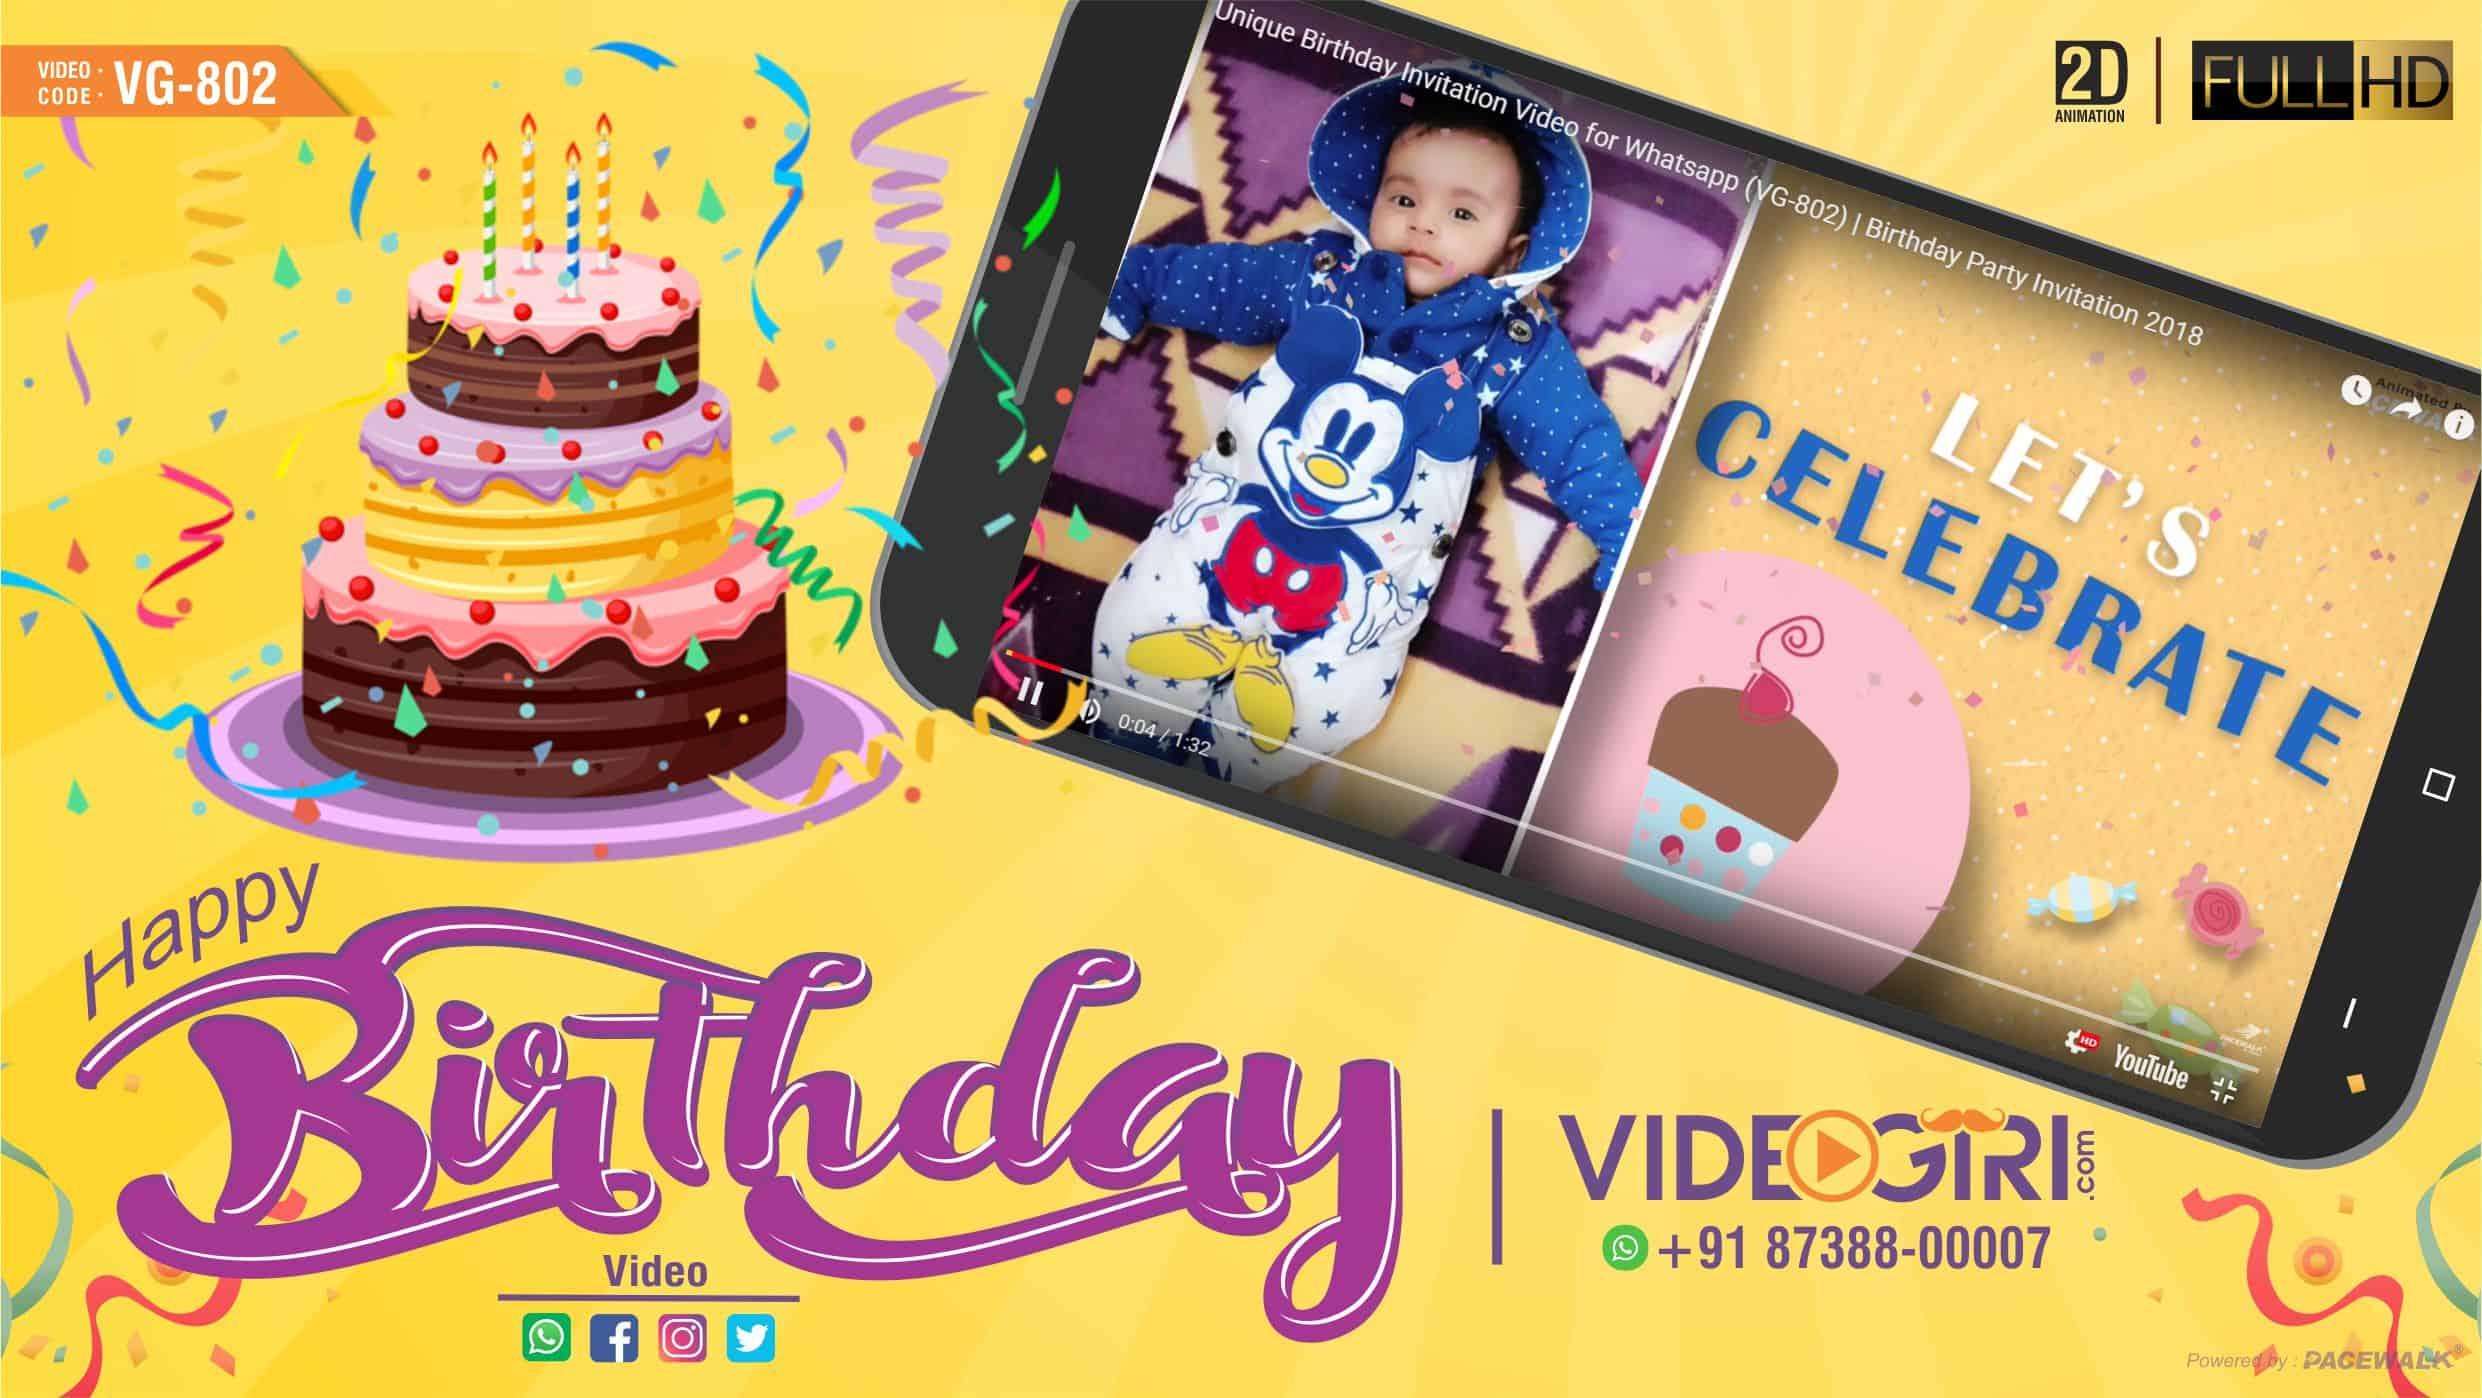 Unique birthday invitation video for whatsapp vg 802 birthday party stopboris Image collections